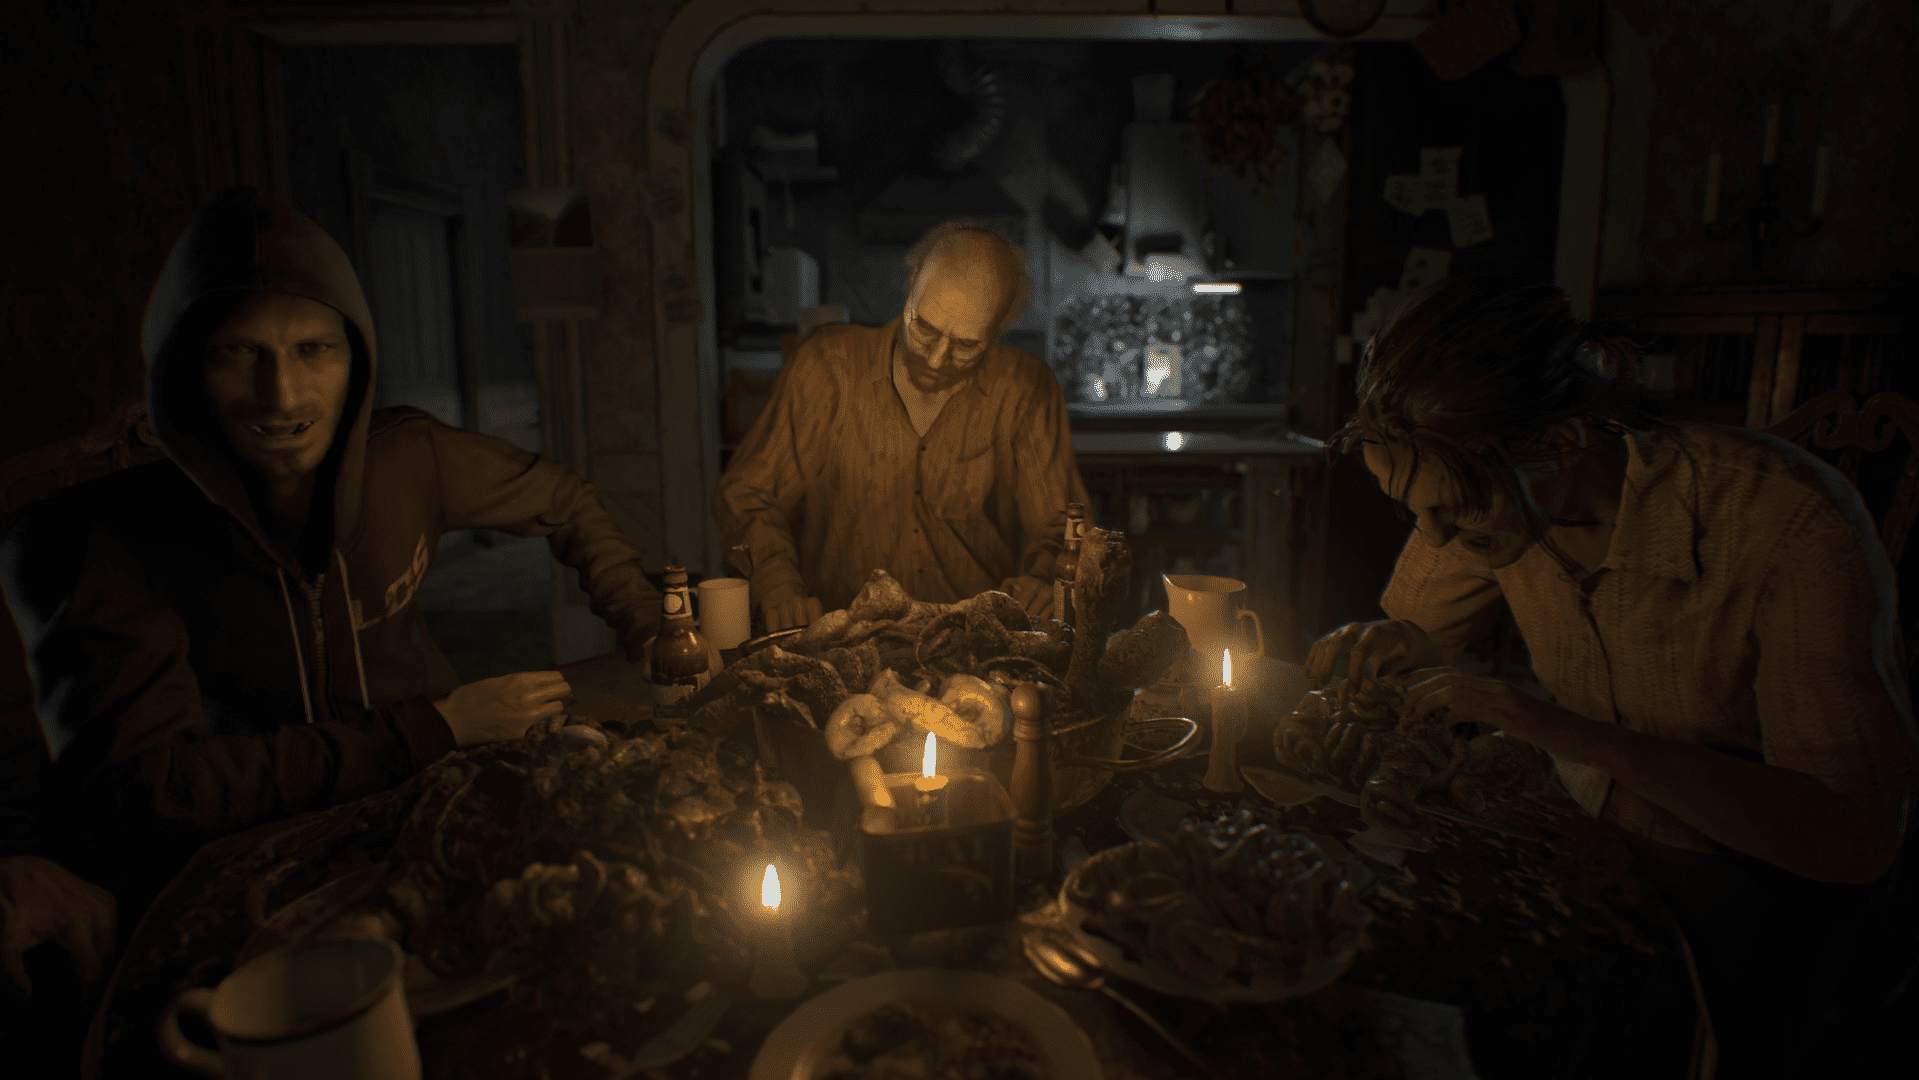 Screenshot of Resident Evil 7: Biohazard (VR game)